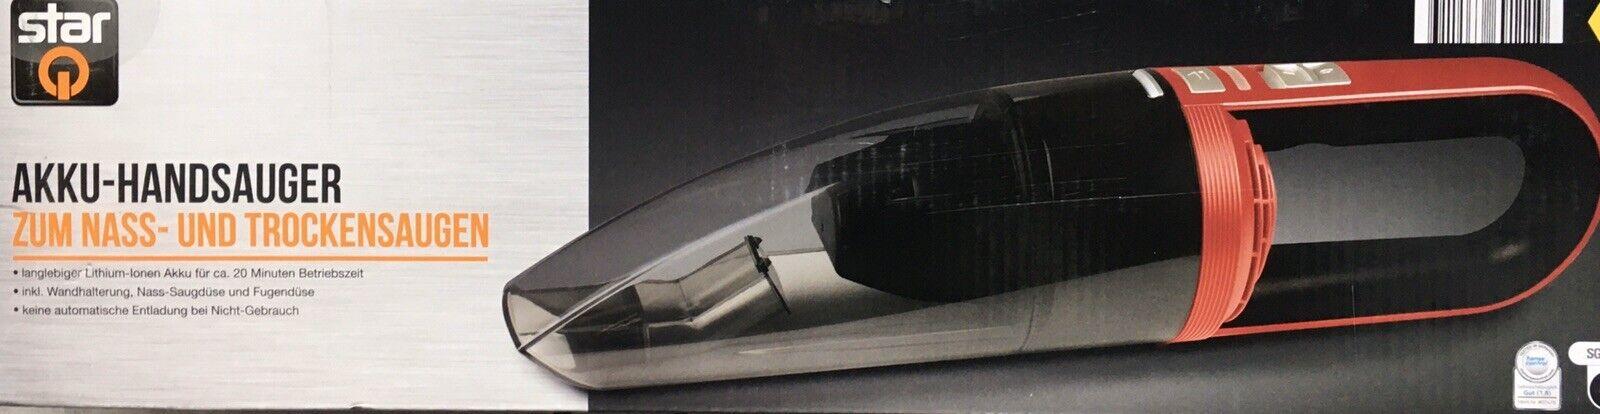 Akku Handstaubsauger Nass und Trockensauger Lithium Ionen 7,4 V Handsauger  NEU